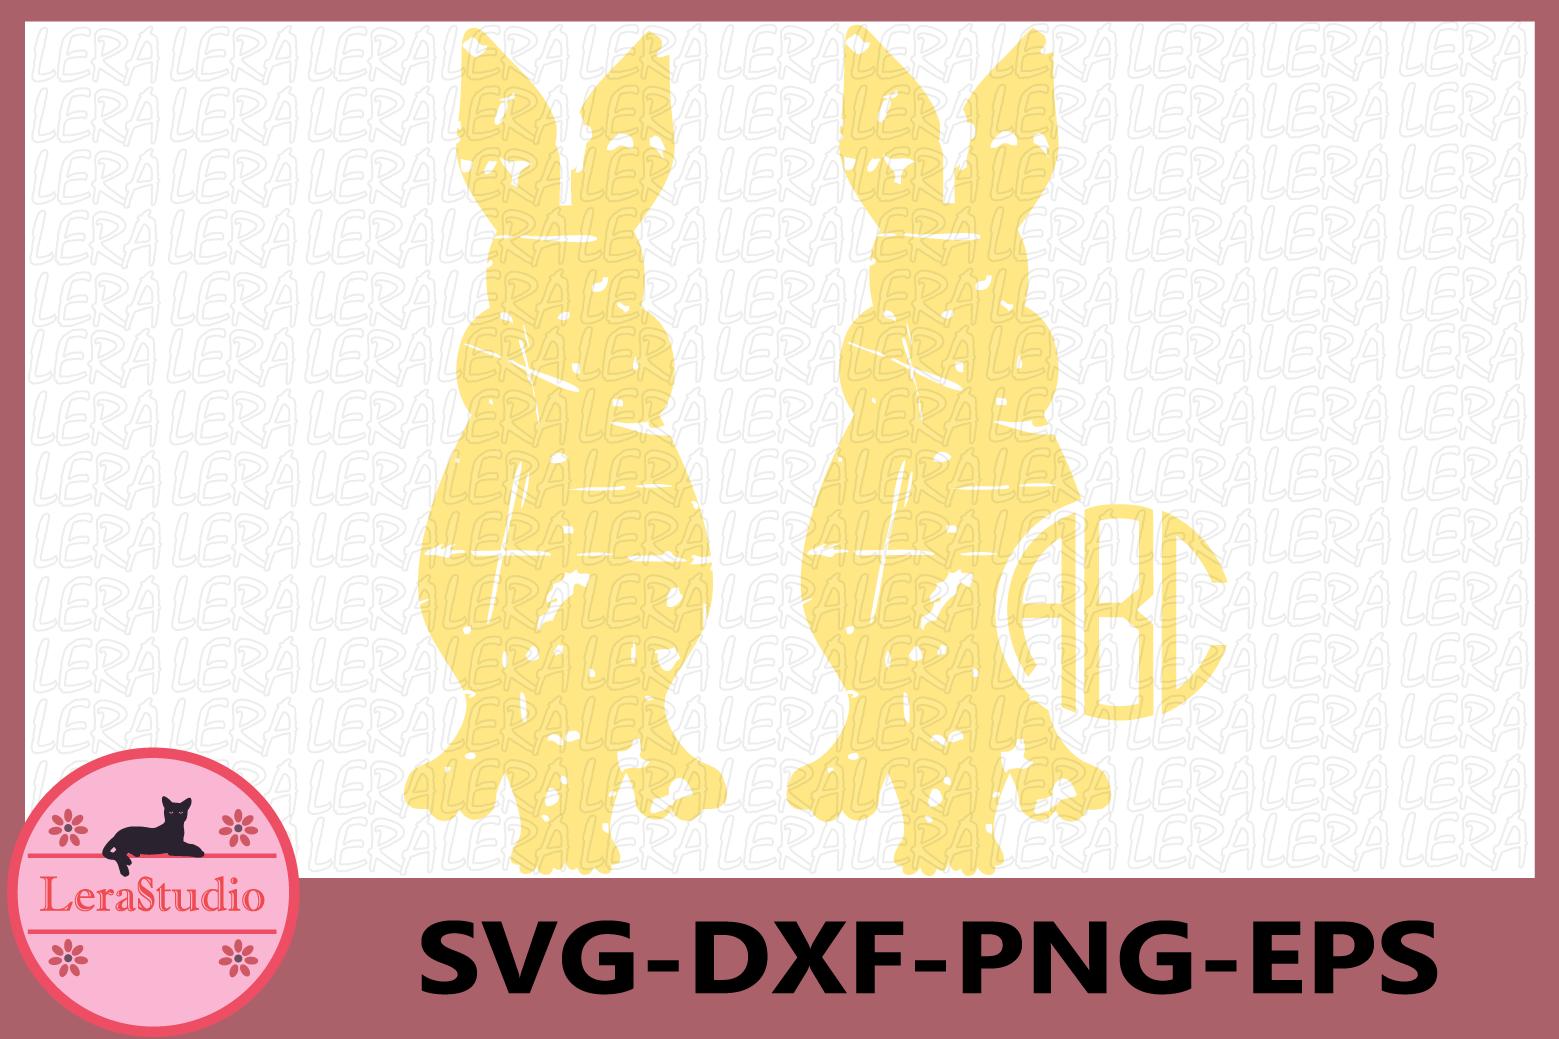 Rabbits Grunge svg, Bunnies SVG, Grunge SVG, Rabbits example image 1